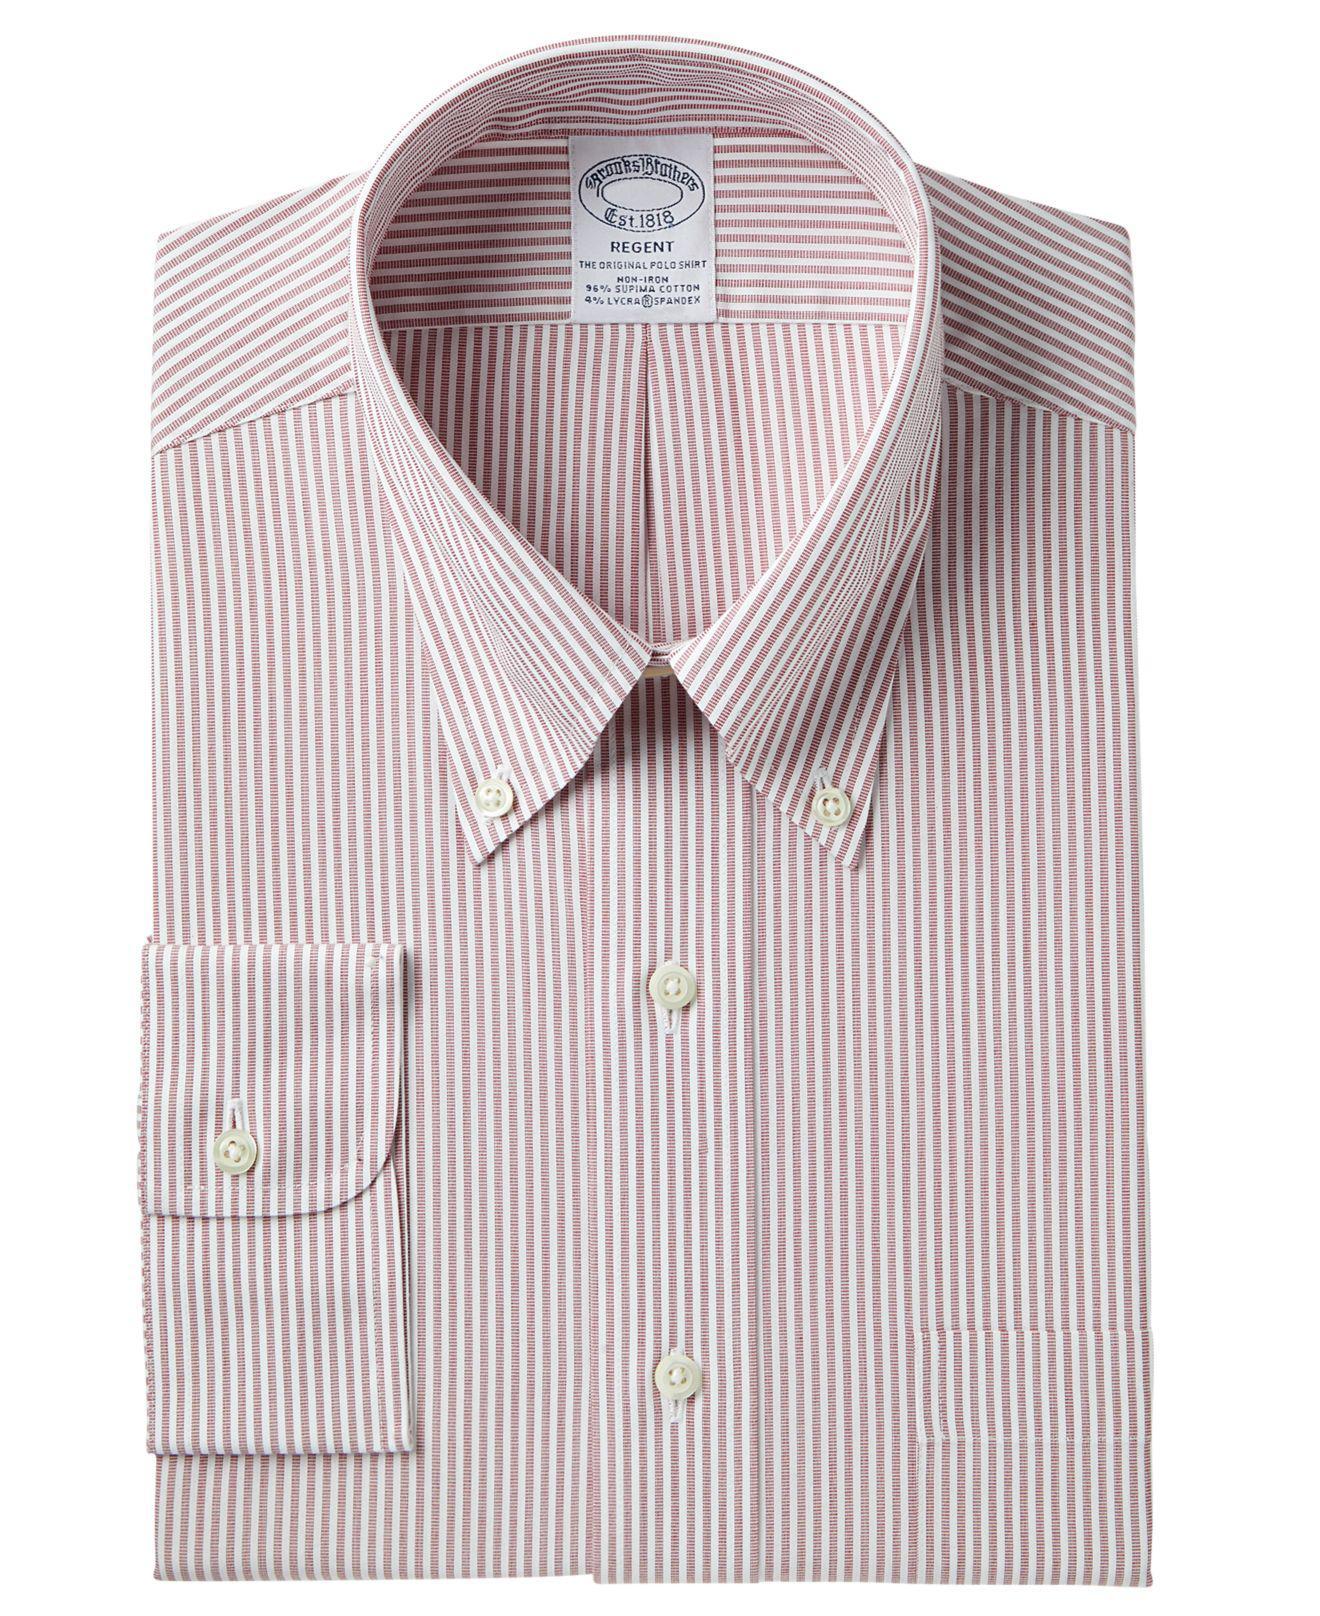 e511d5a2f8b0 Brooks Brothers. Men s Regent Slim-fit Non-iron Broadcloth Stretch Stripe  Dress Shirt